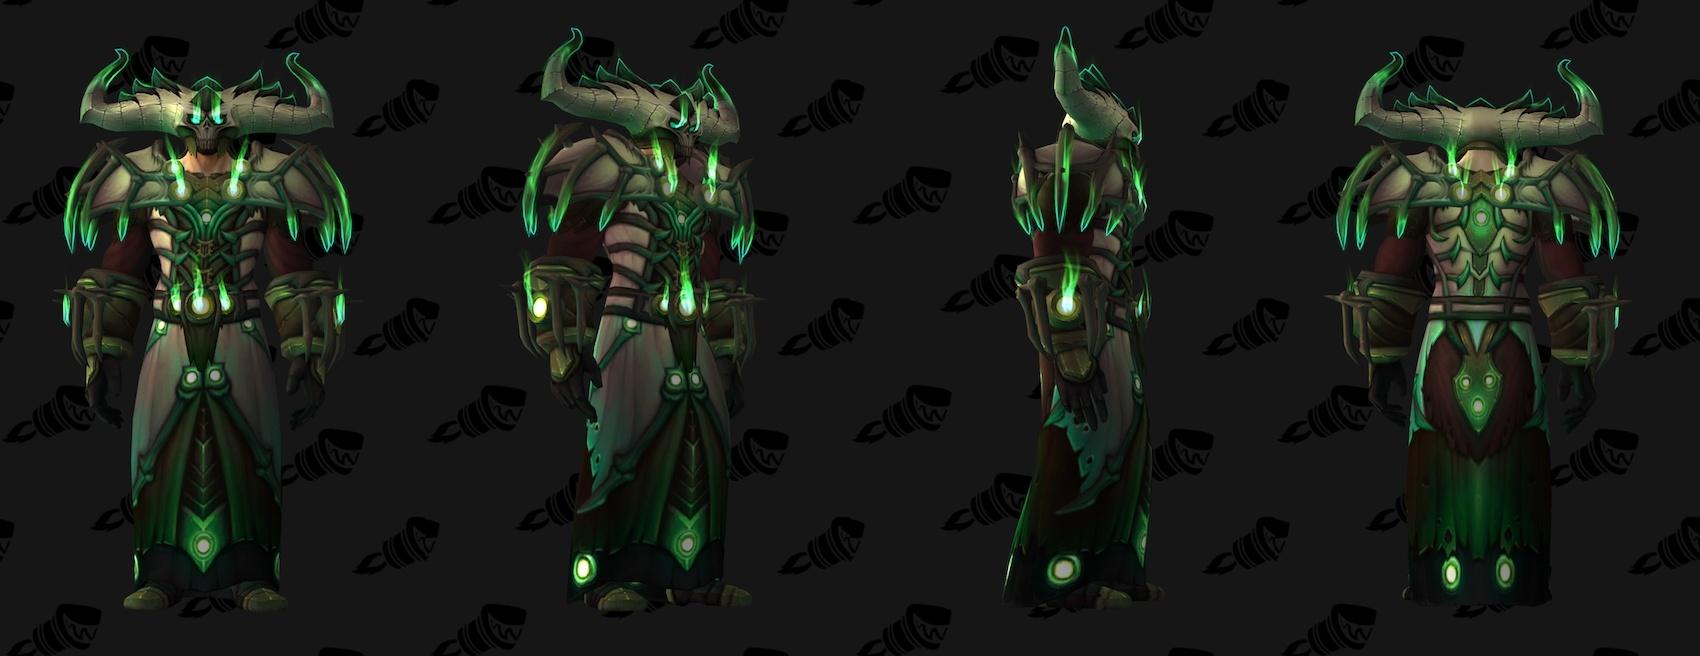 Warlock Tier 20 Armor Set Models - Wowhead News